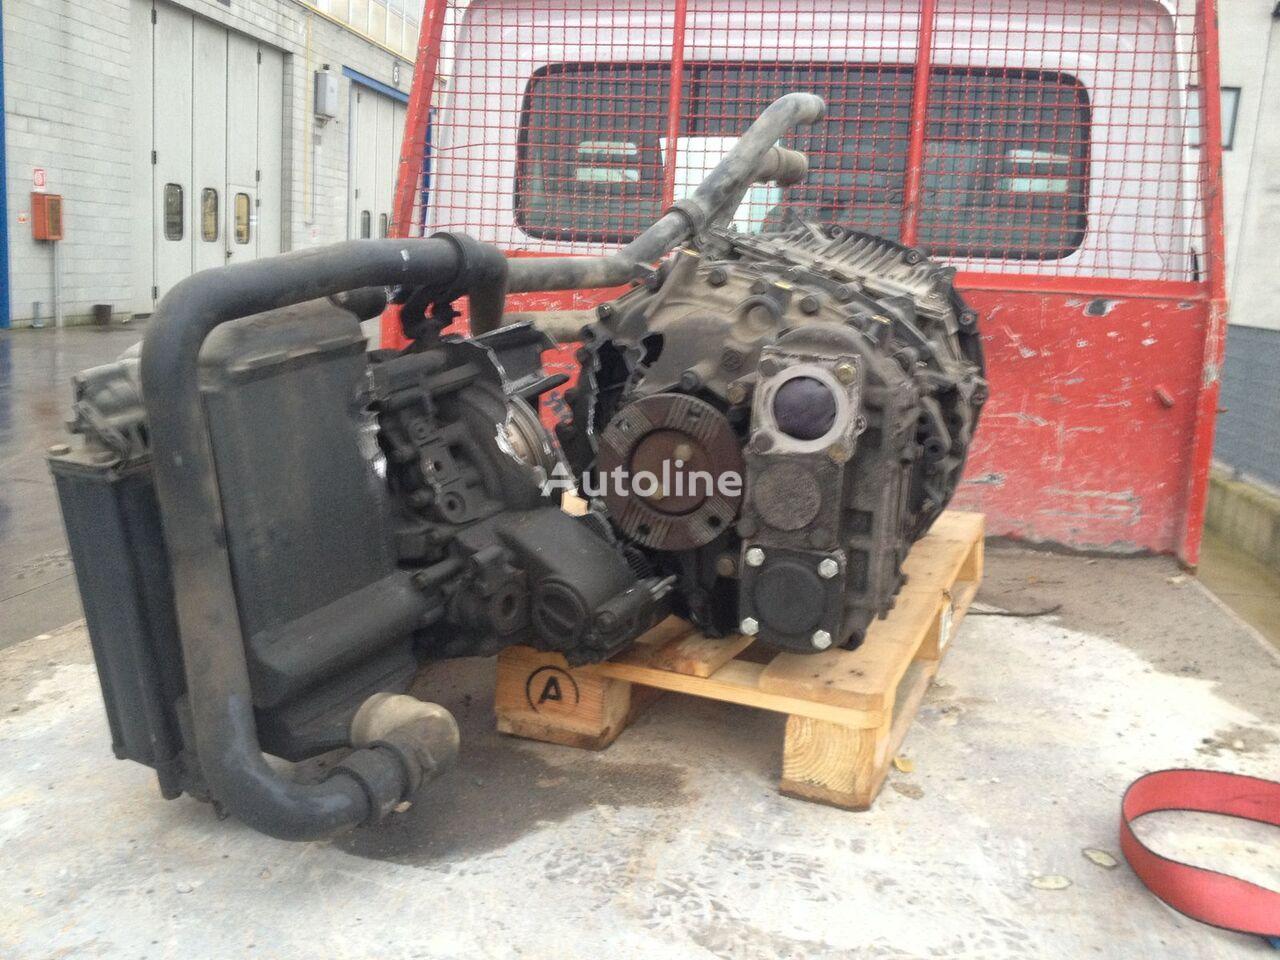 ZF 12 AS 2331 TO TRAKKER Getriebe für IVECO TRAKKER E5 Sattelzugmaschine